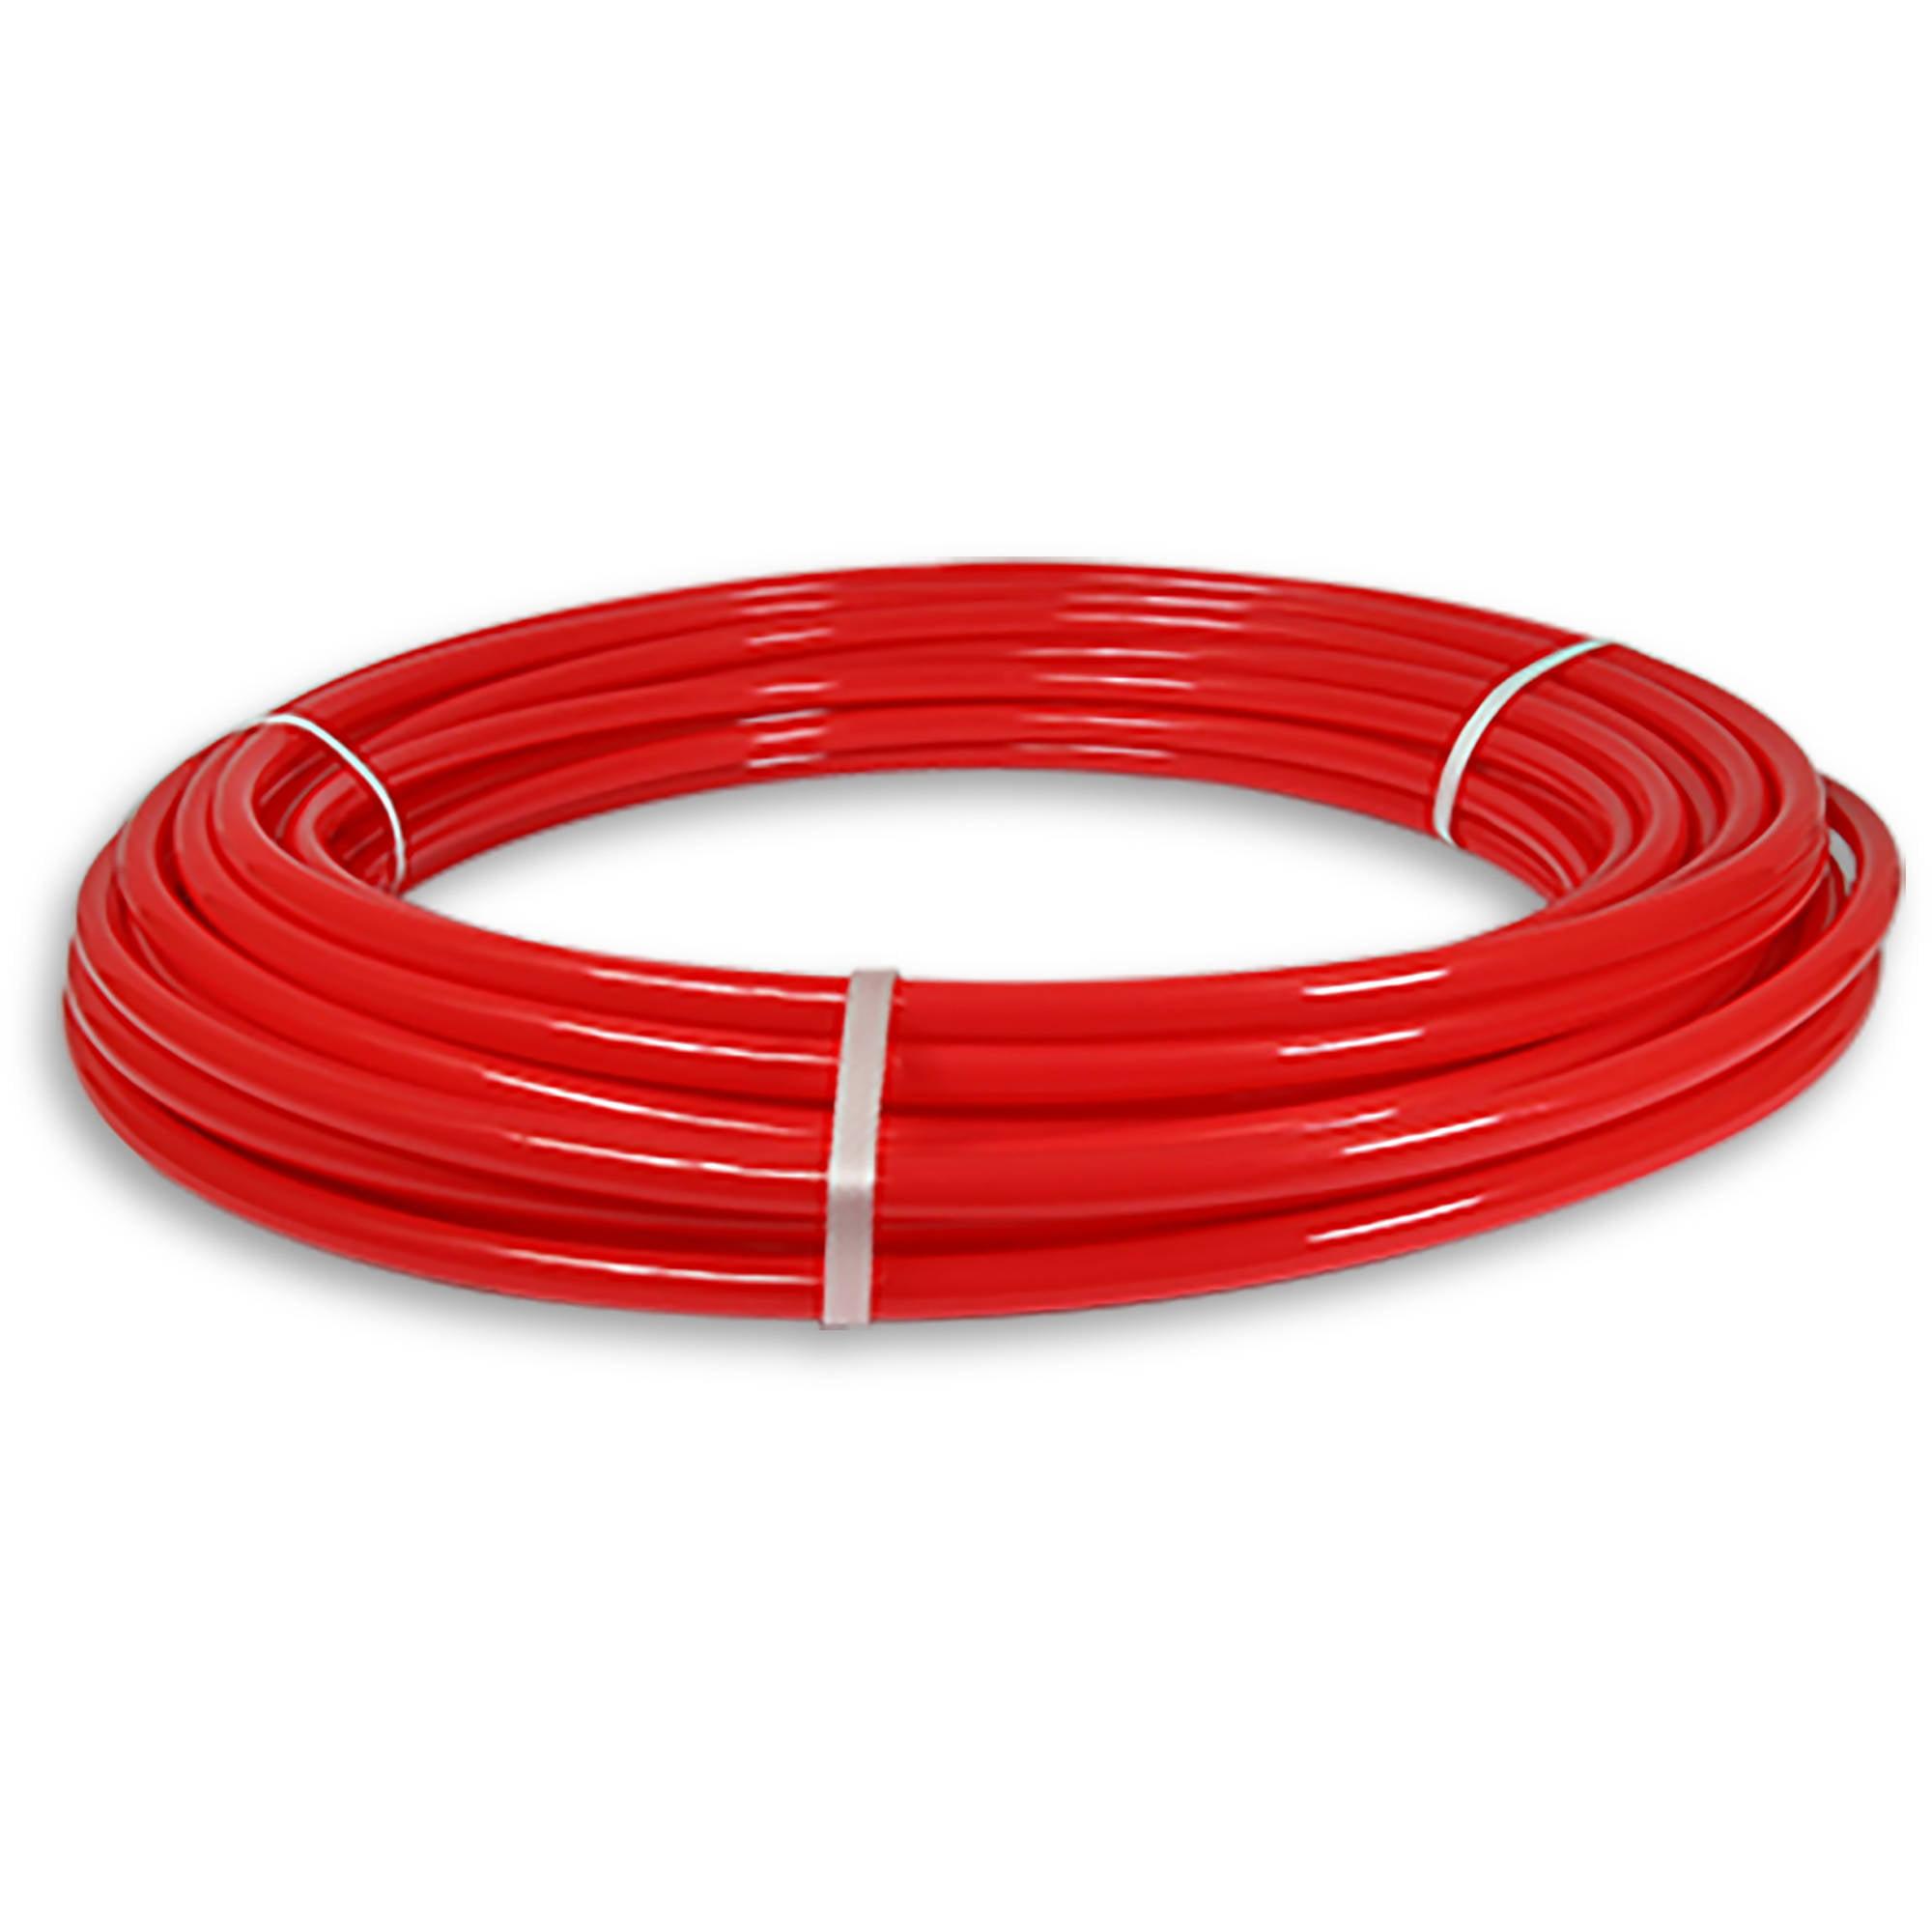 "Pexflow PFW-R12100 Pex Tubing, Potable Water Red, 1/2"" x 100' (30.3m)"